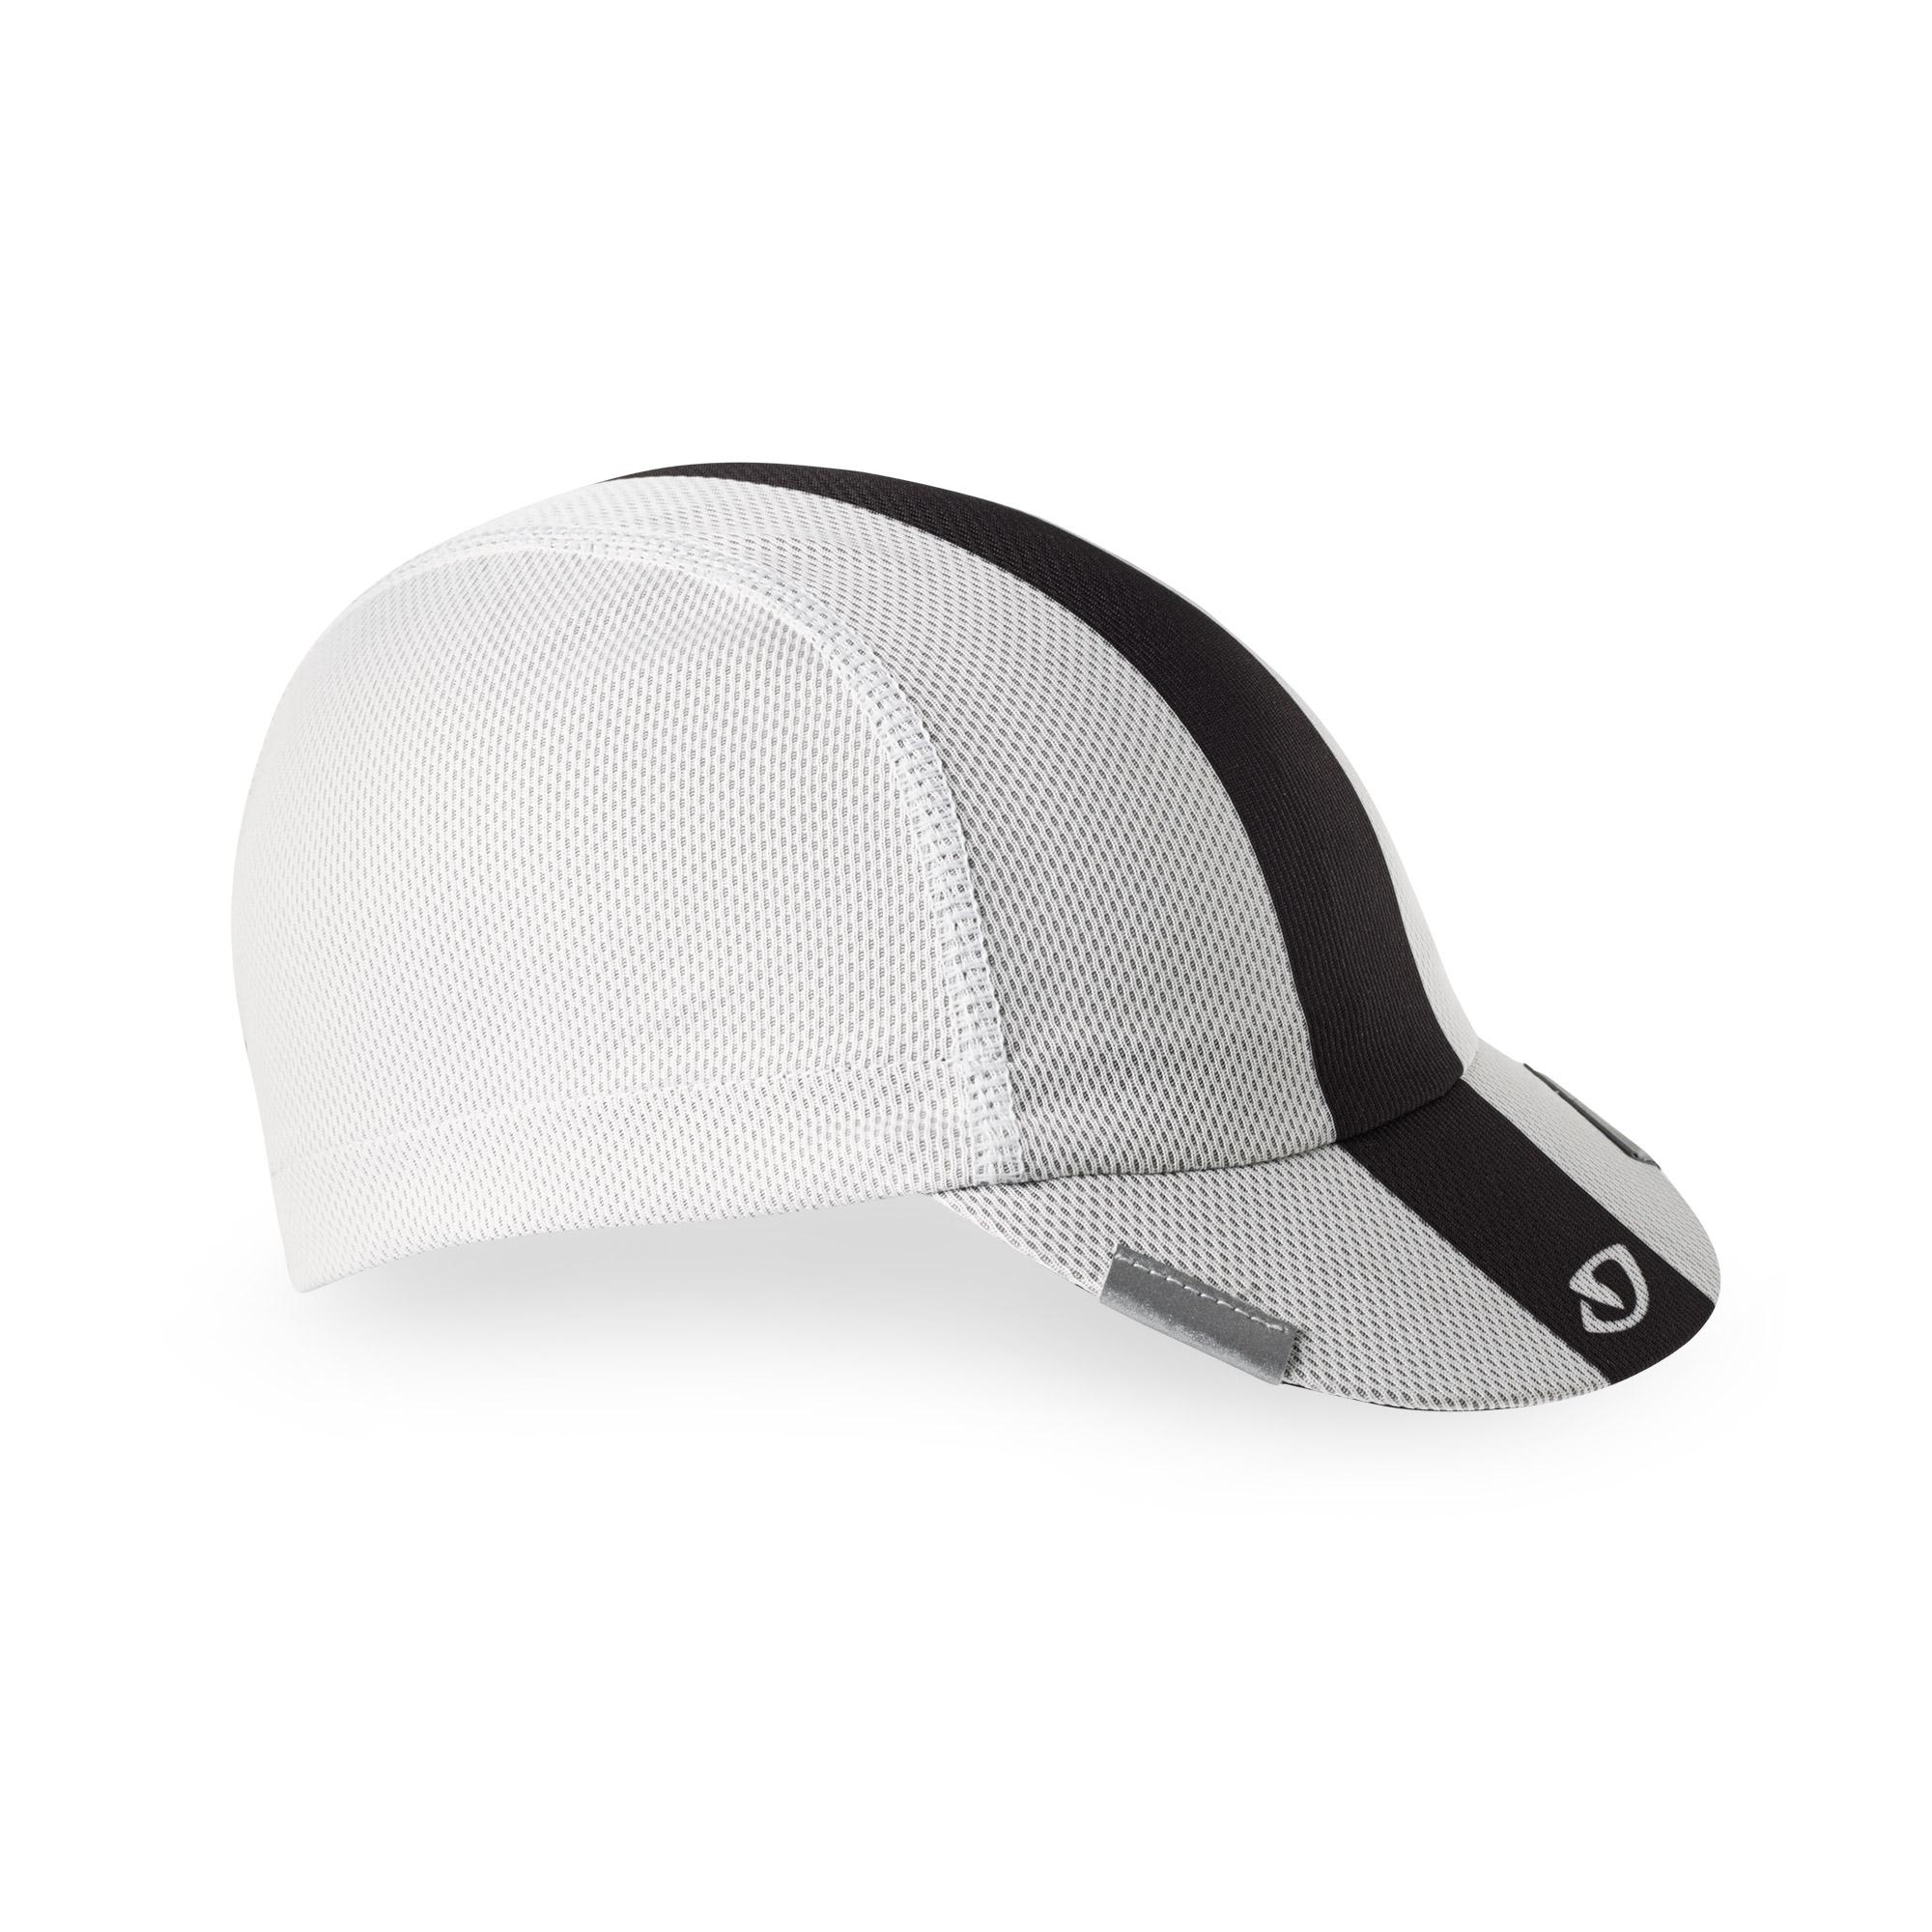 GIRO | PELOTON Cycling Cap White/black/grey